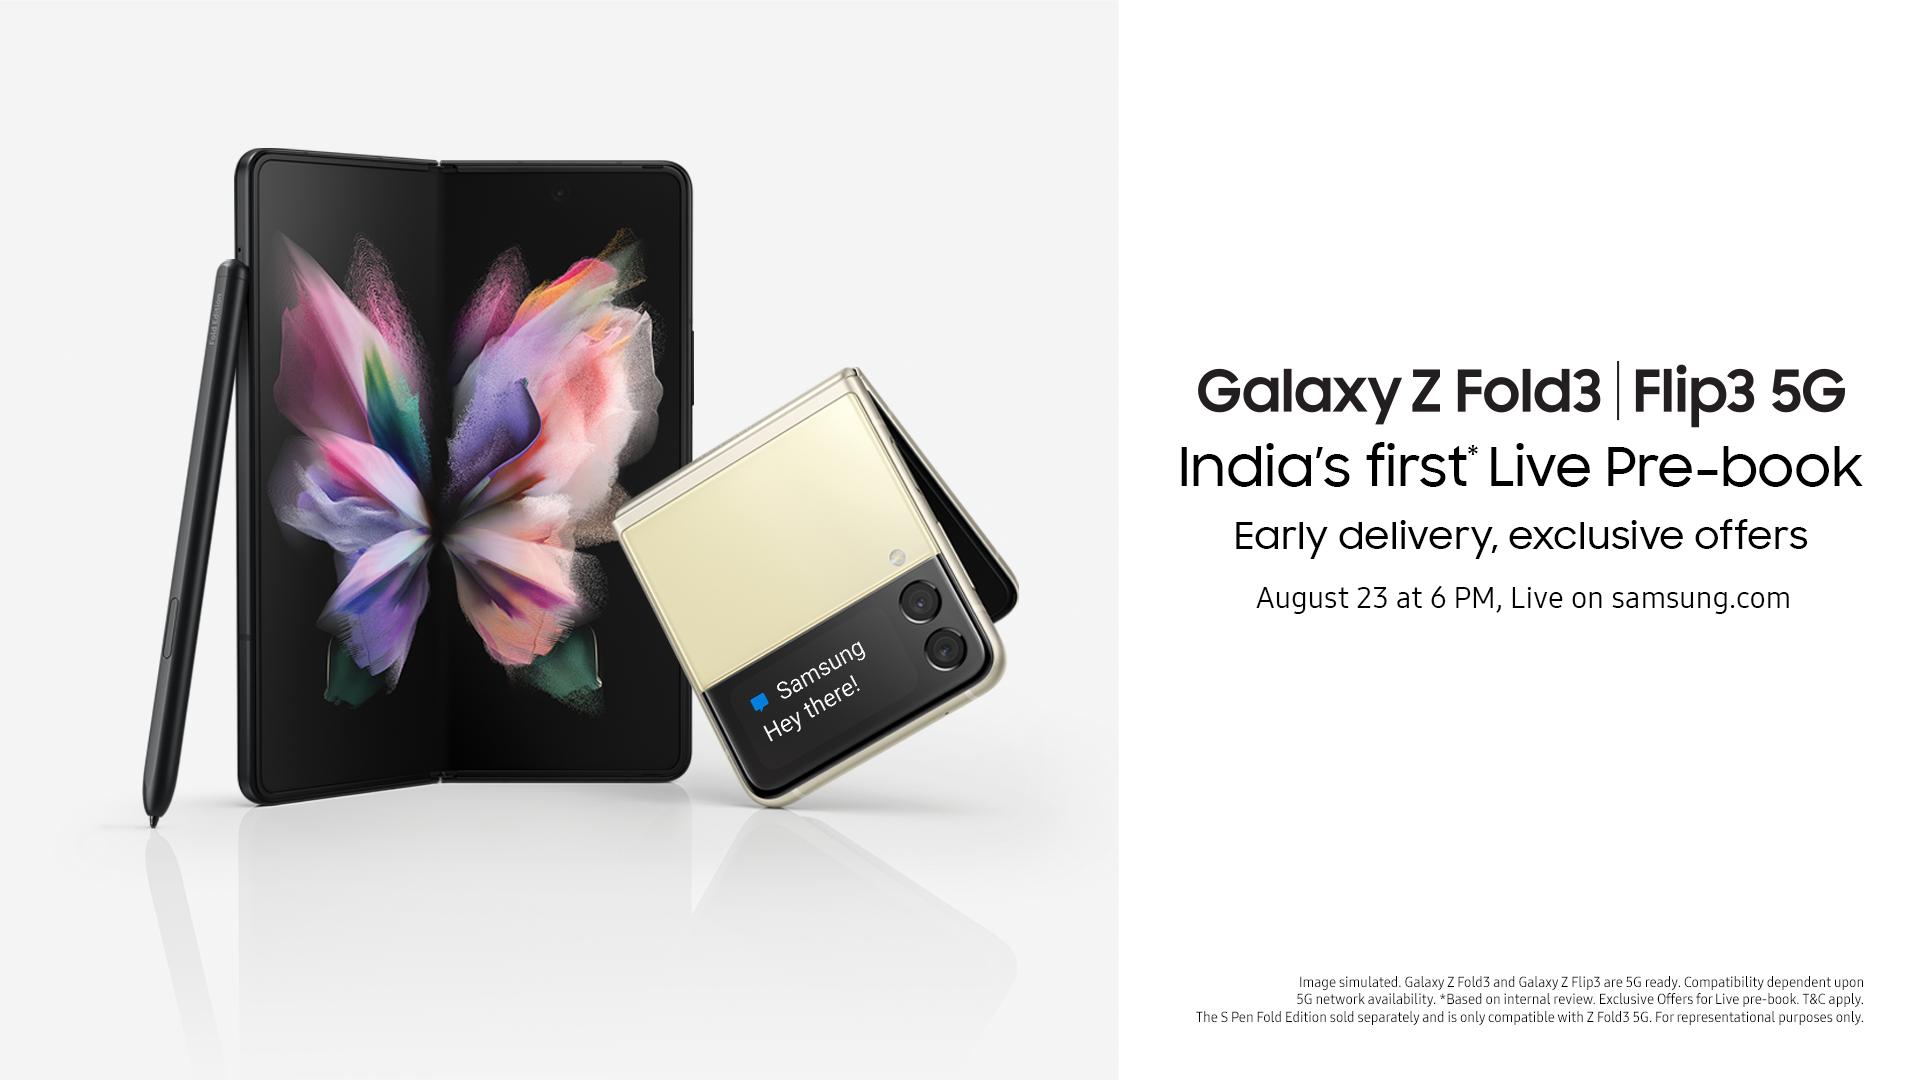 Samsung Now Galaxy Z Fold 3 Galaxy Z Flip 3 Pre-Order India